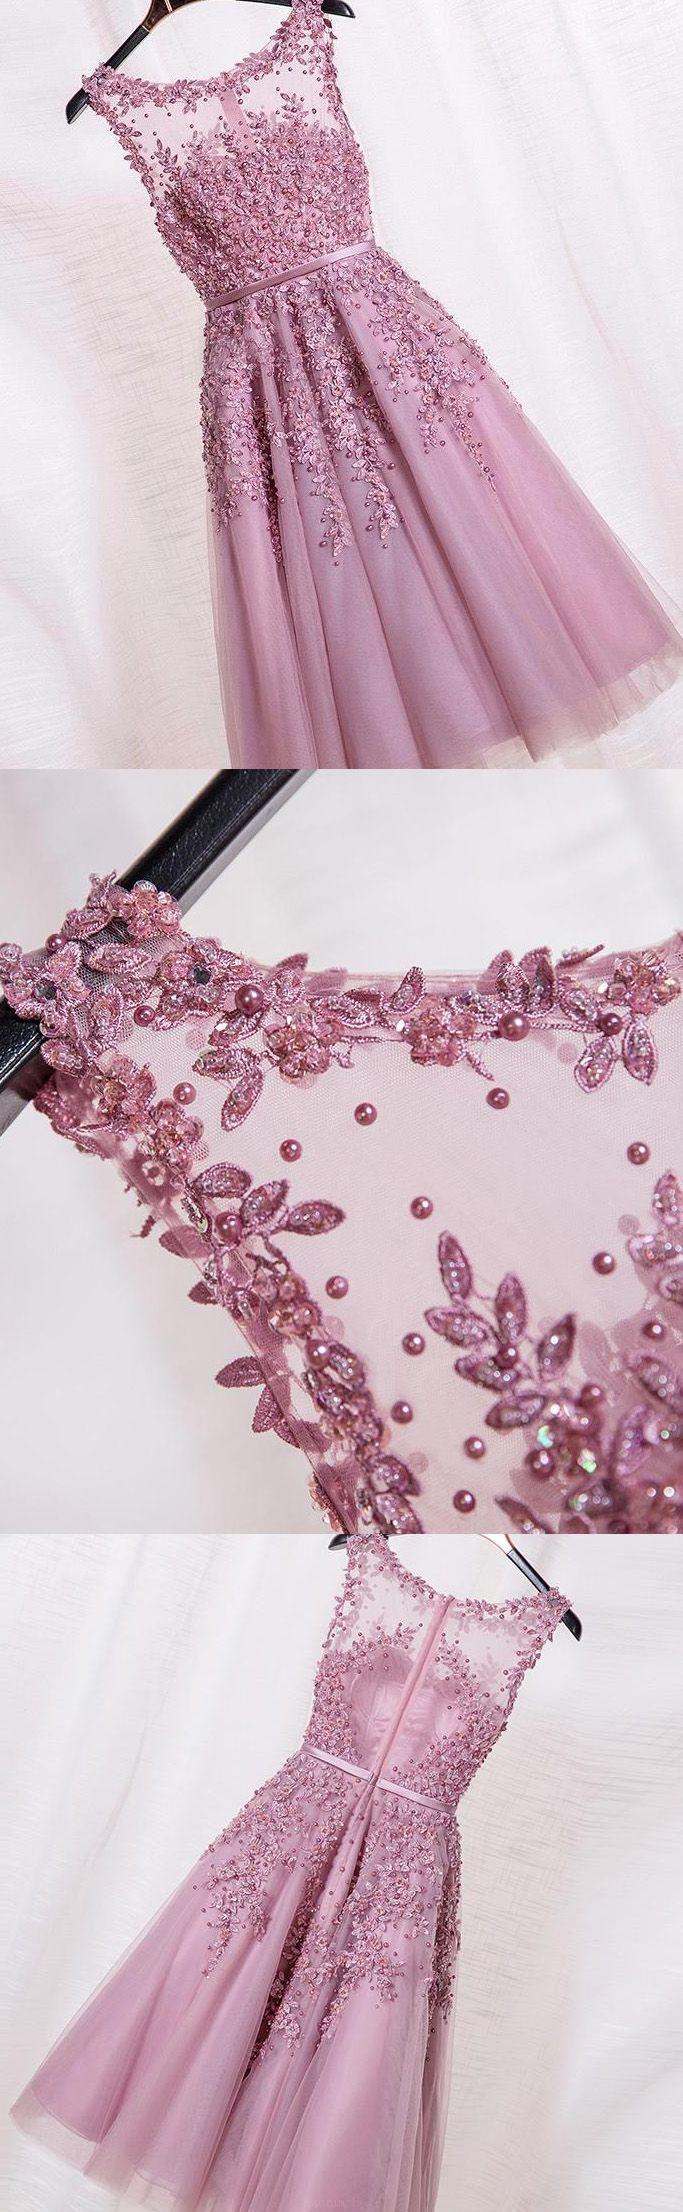 Short prom dresses prom dresses short lilac prom dresses beaded